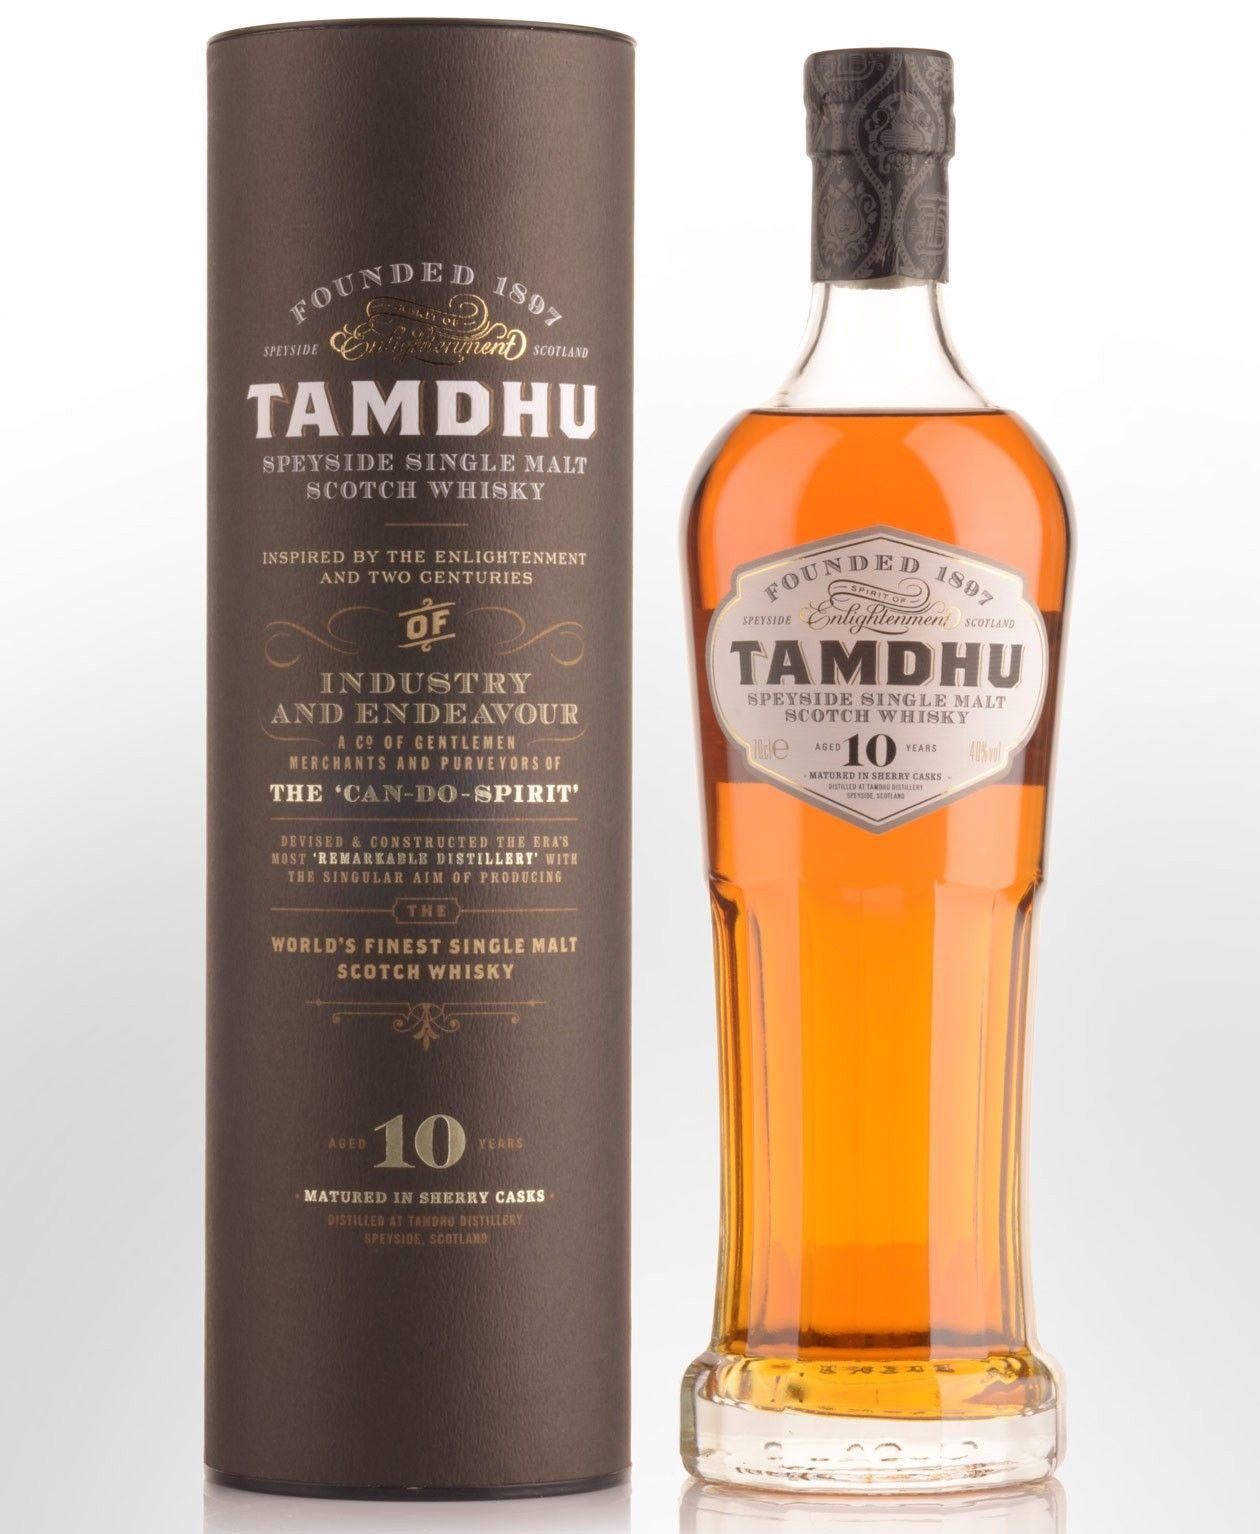 Tamdhu 10 Year Old Single Malt Scotch Whisky 700ml Scotch